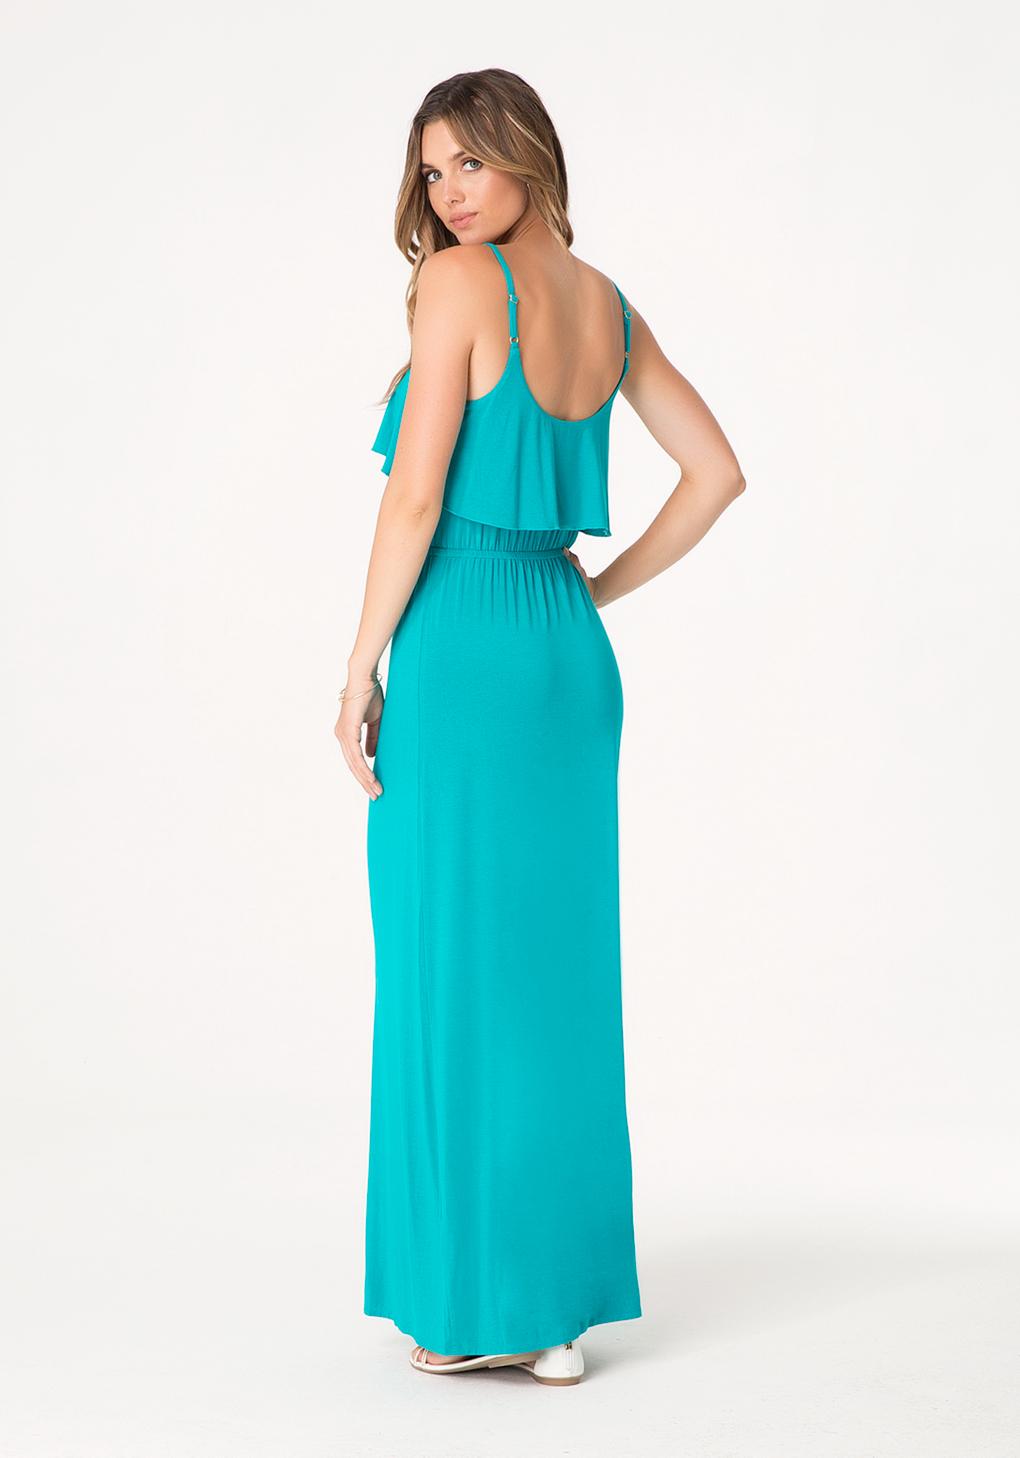 Lyst - Bebe Logo Ruffle Maxi Dress in Blue